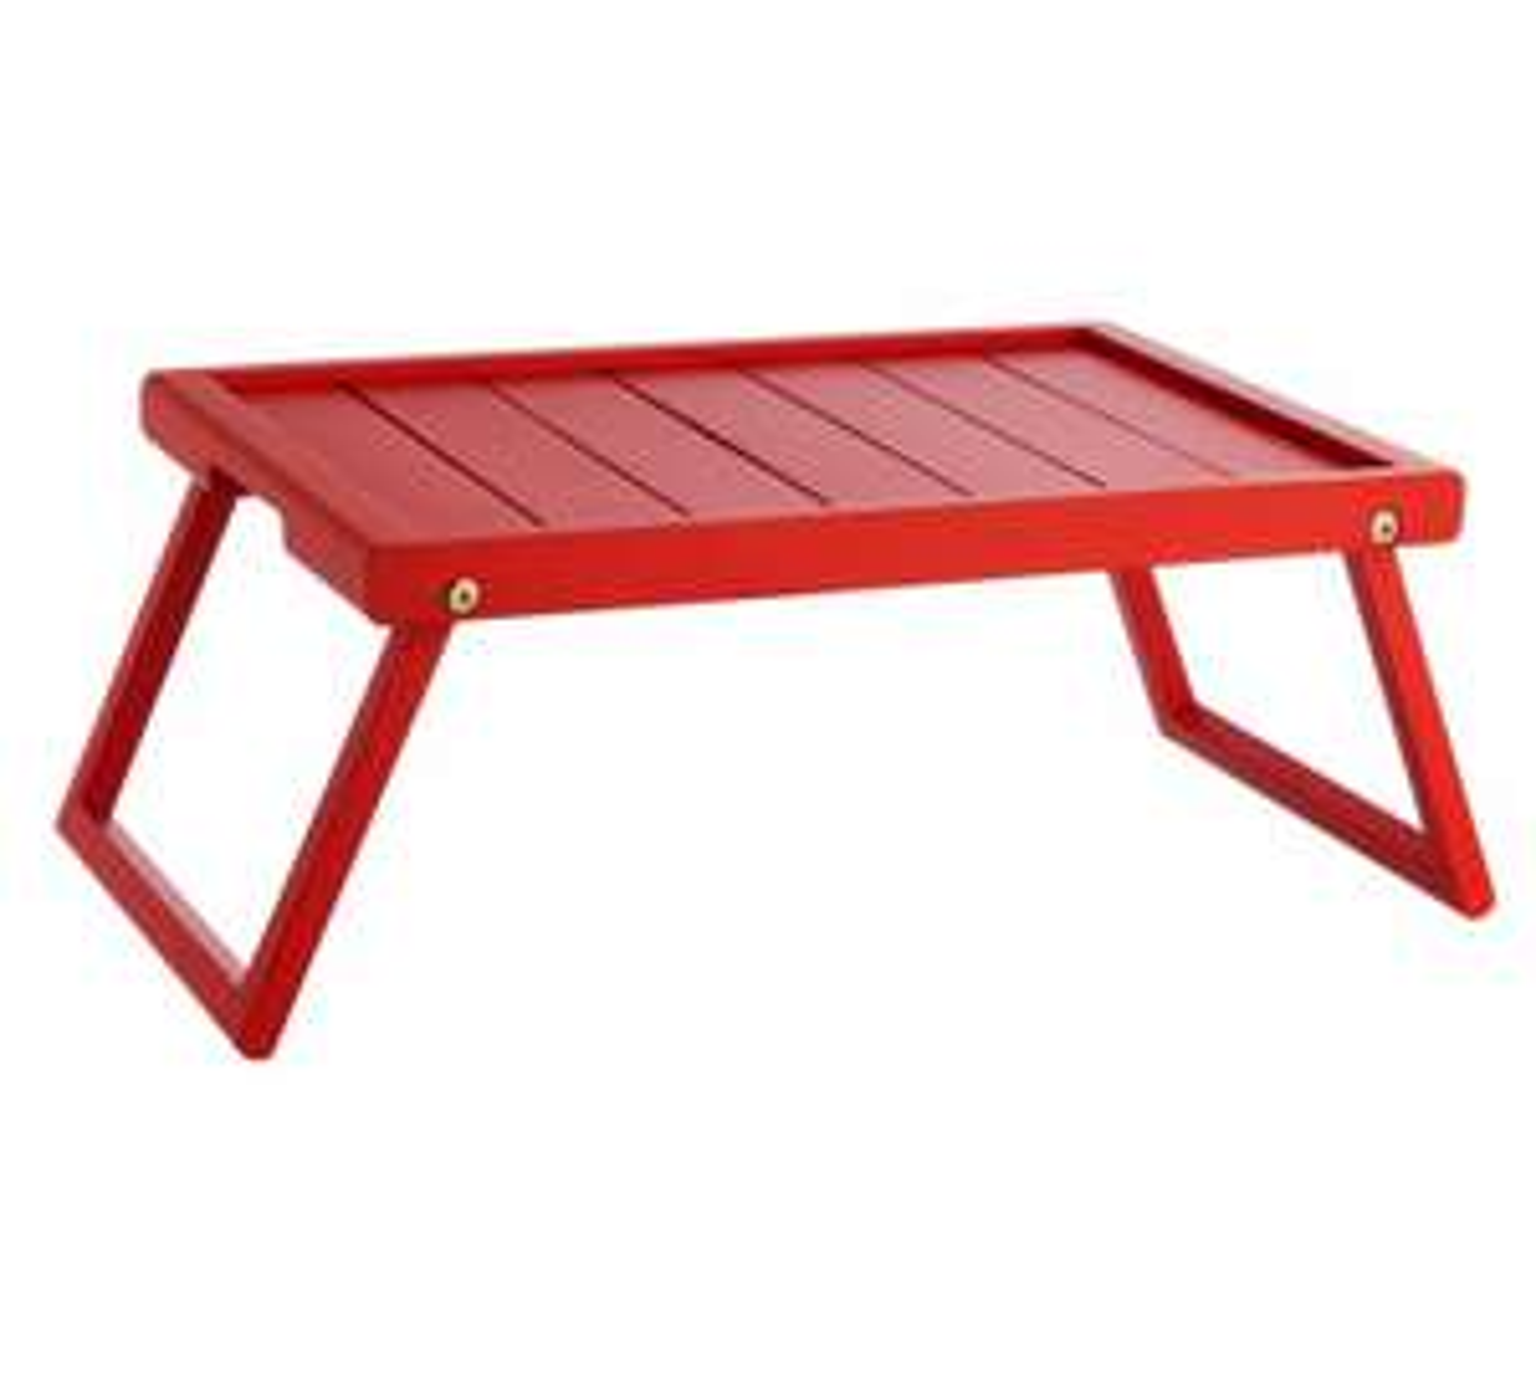 Habitat Tiffany Folding Breakfast Tray - Red. 1/2 price @ Argos now £12.50